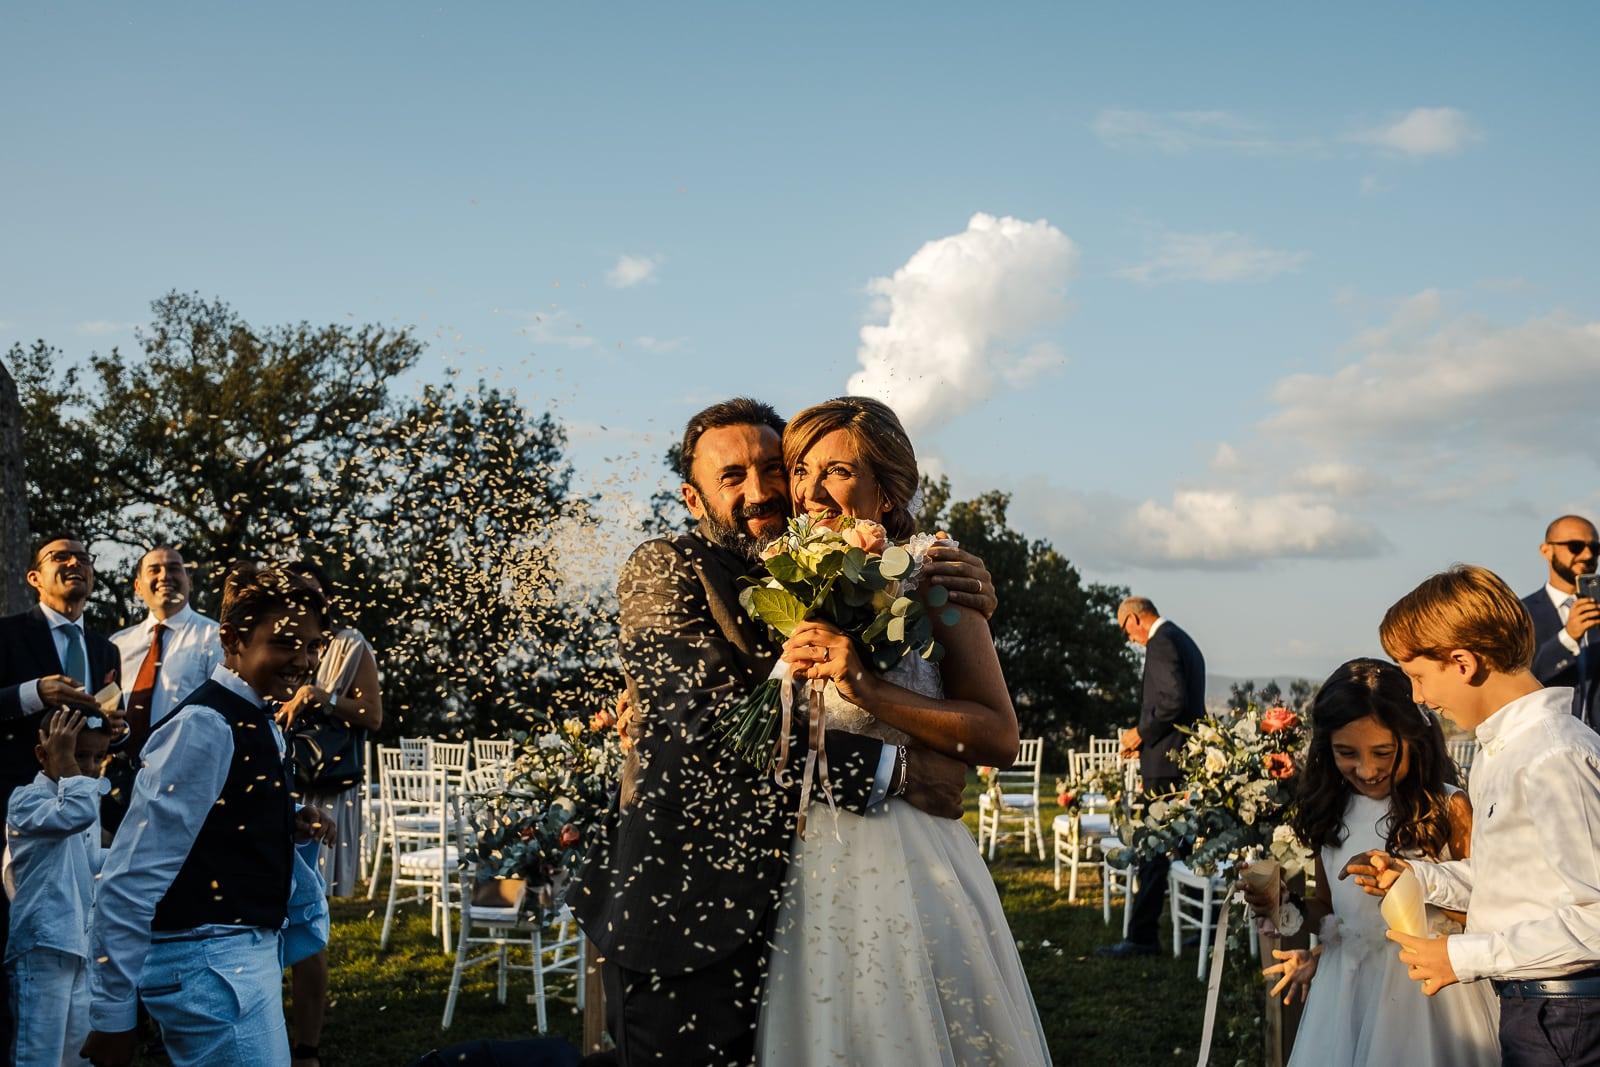 matrimonio_bomarzo_il giardino e la dimora_cerimonia